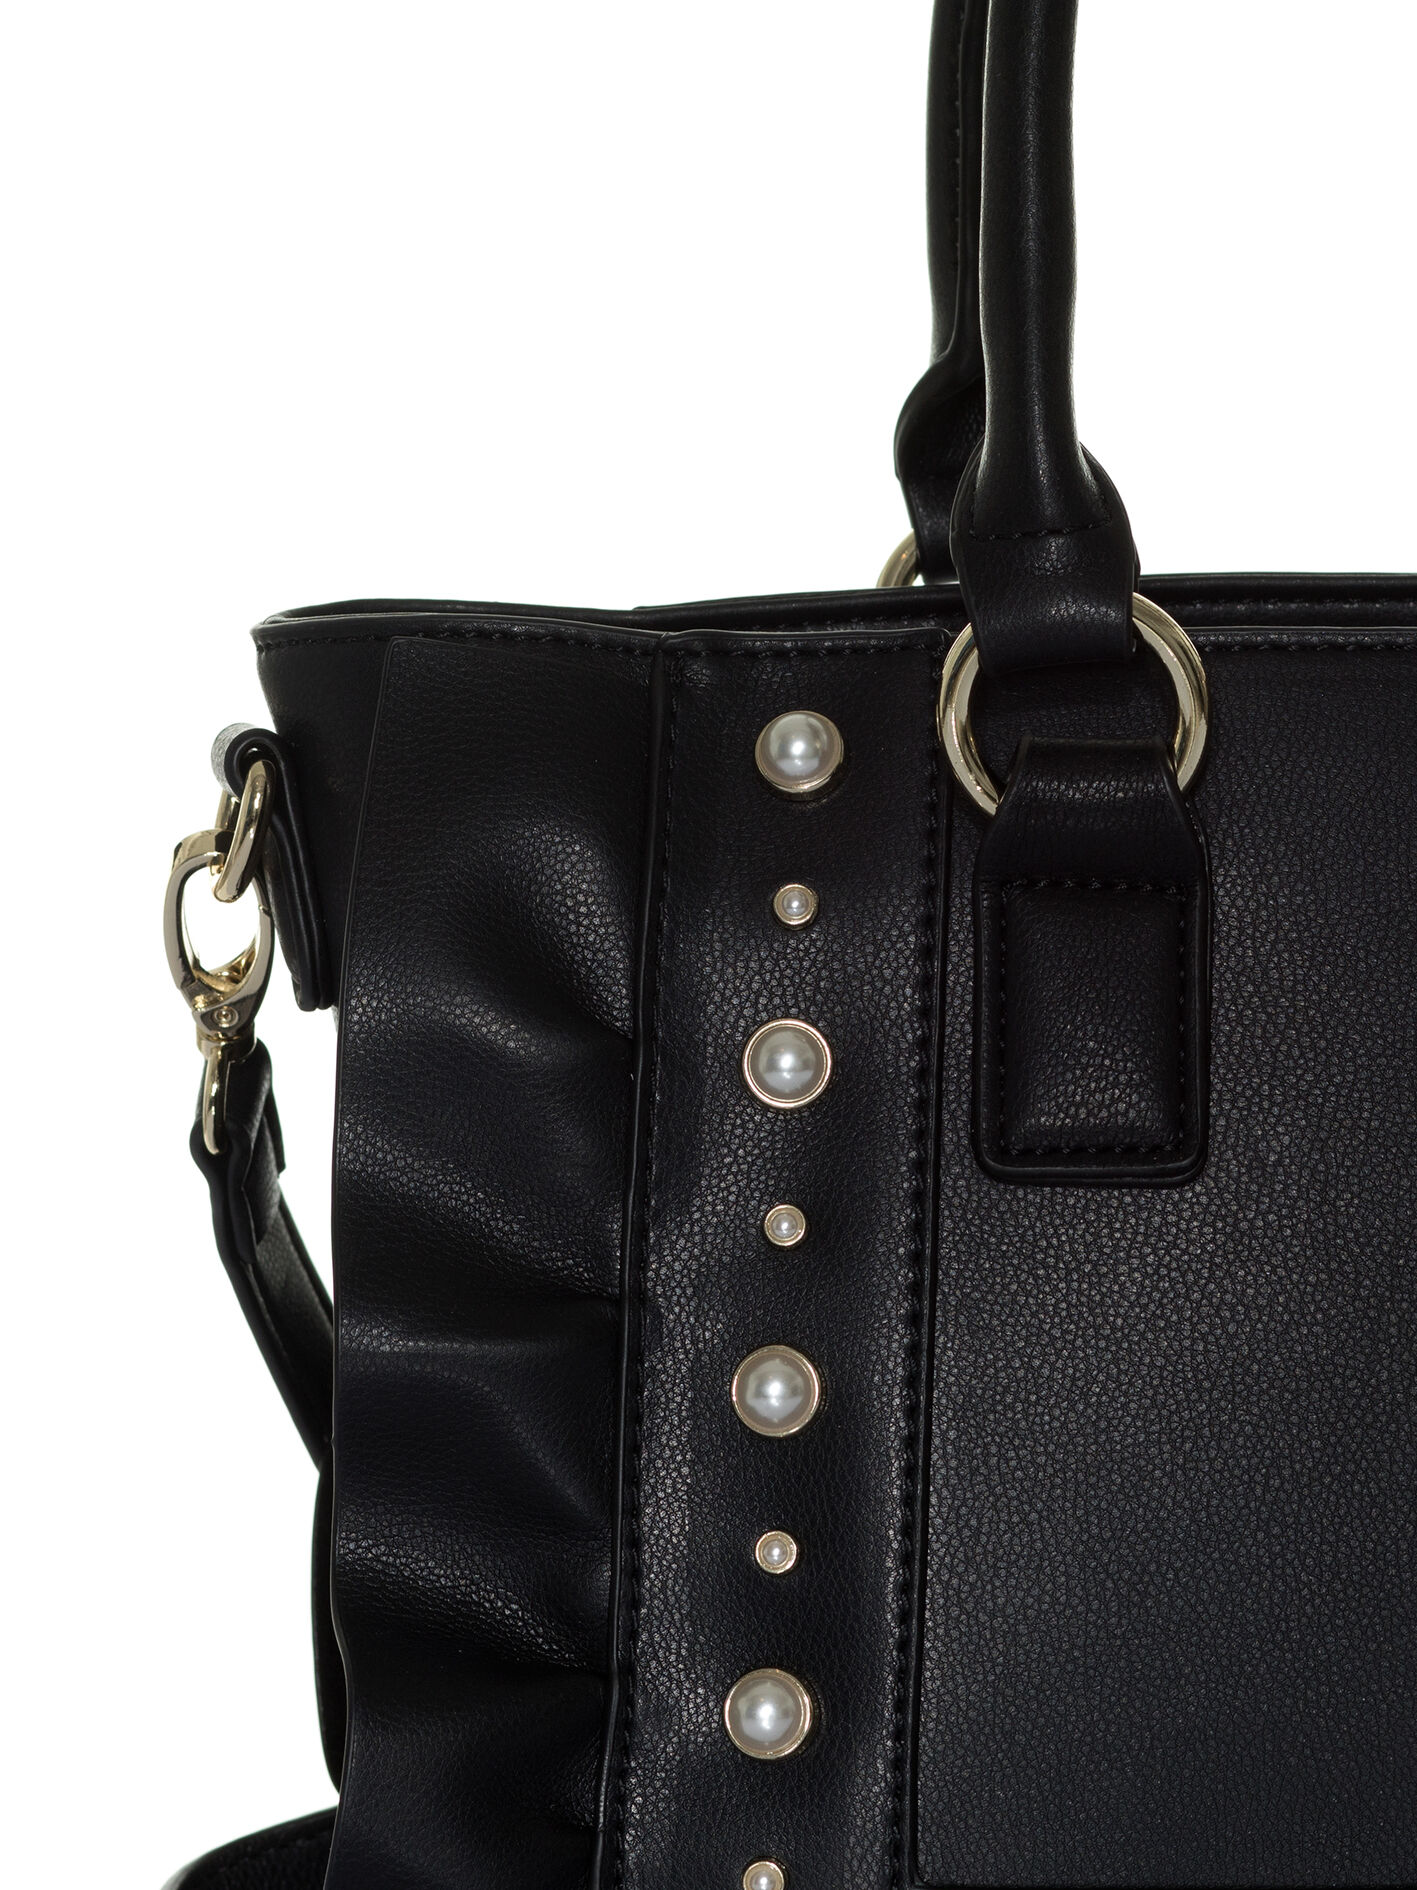 You're Gorgeous Bag